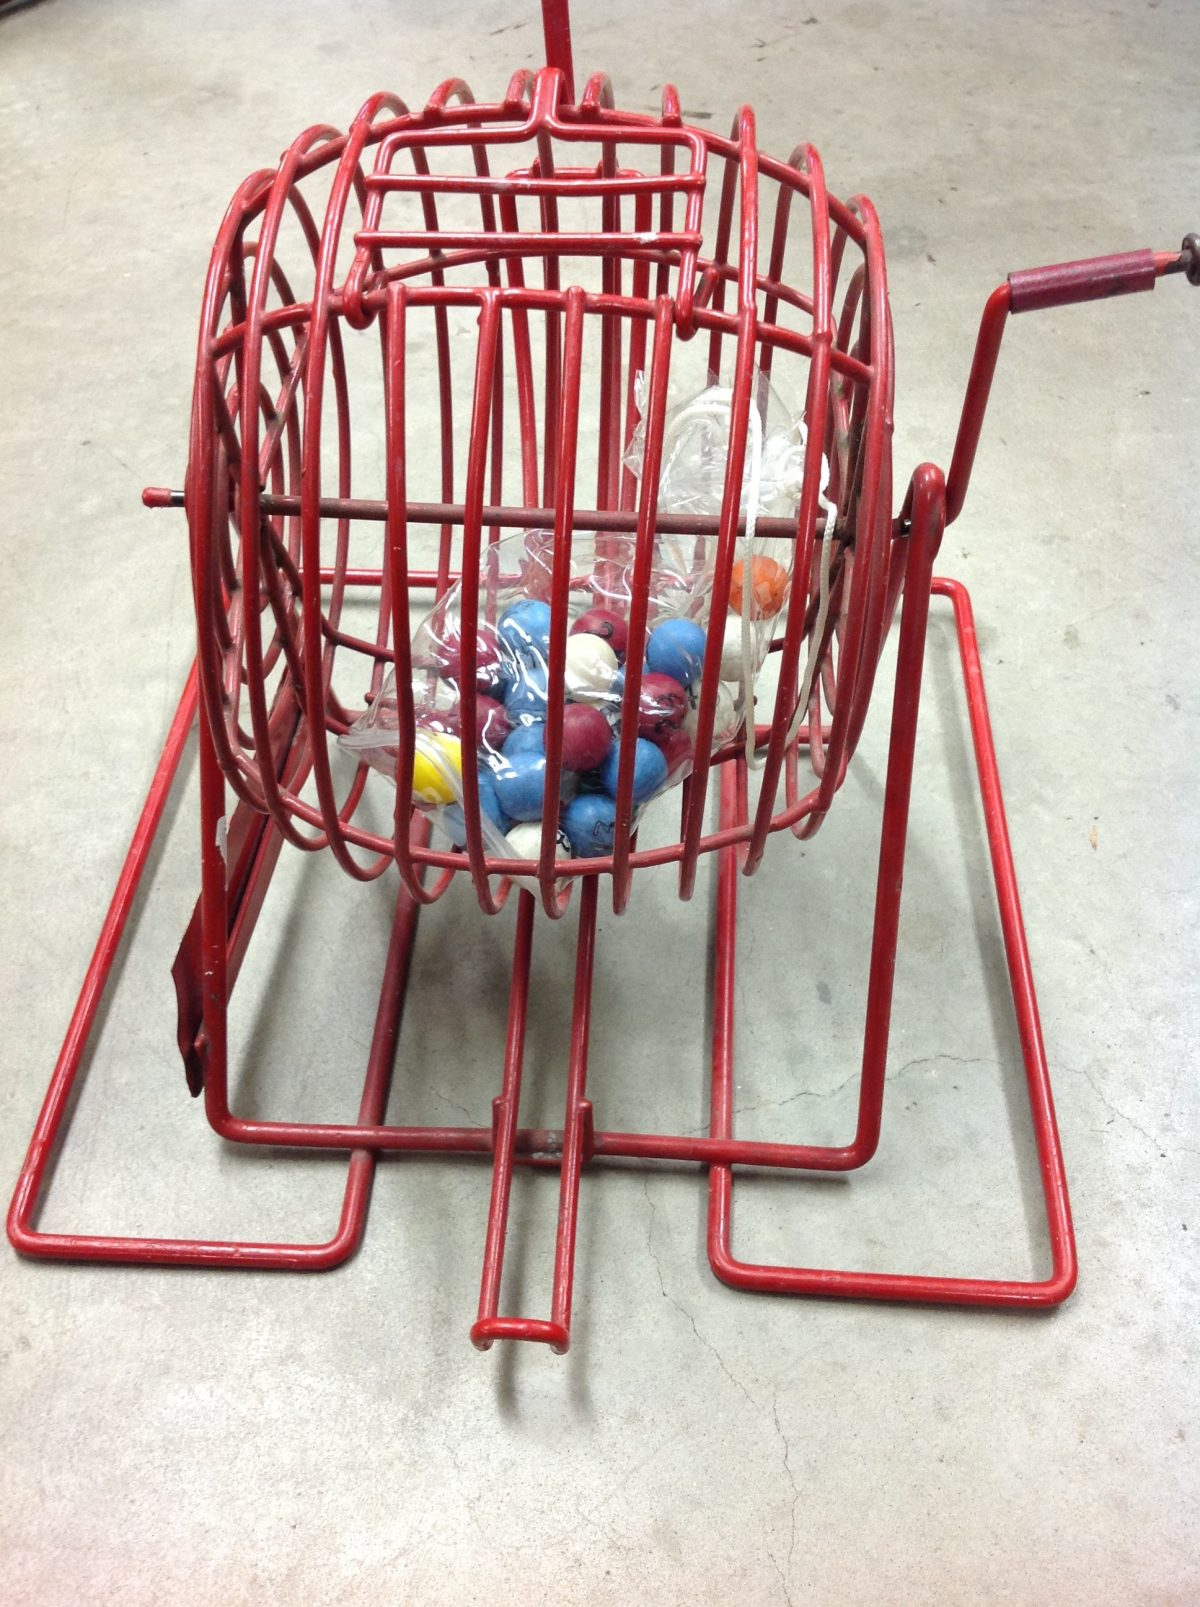 Bernard Tombola Bingo Lottery Cage On The Square